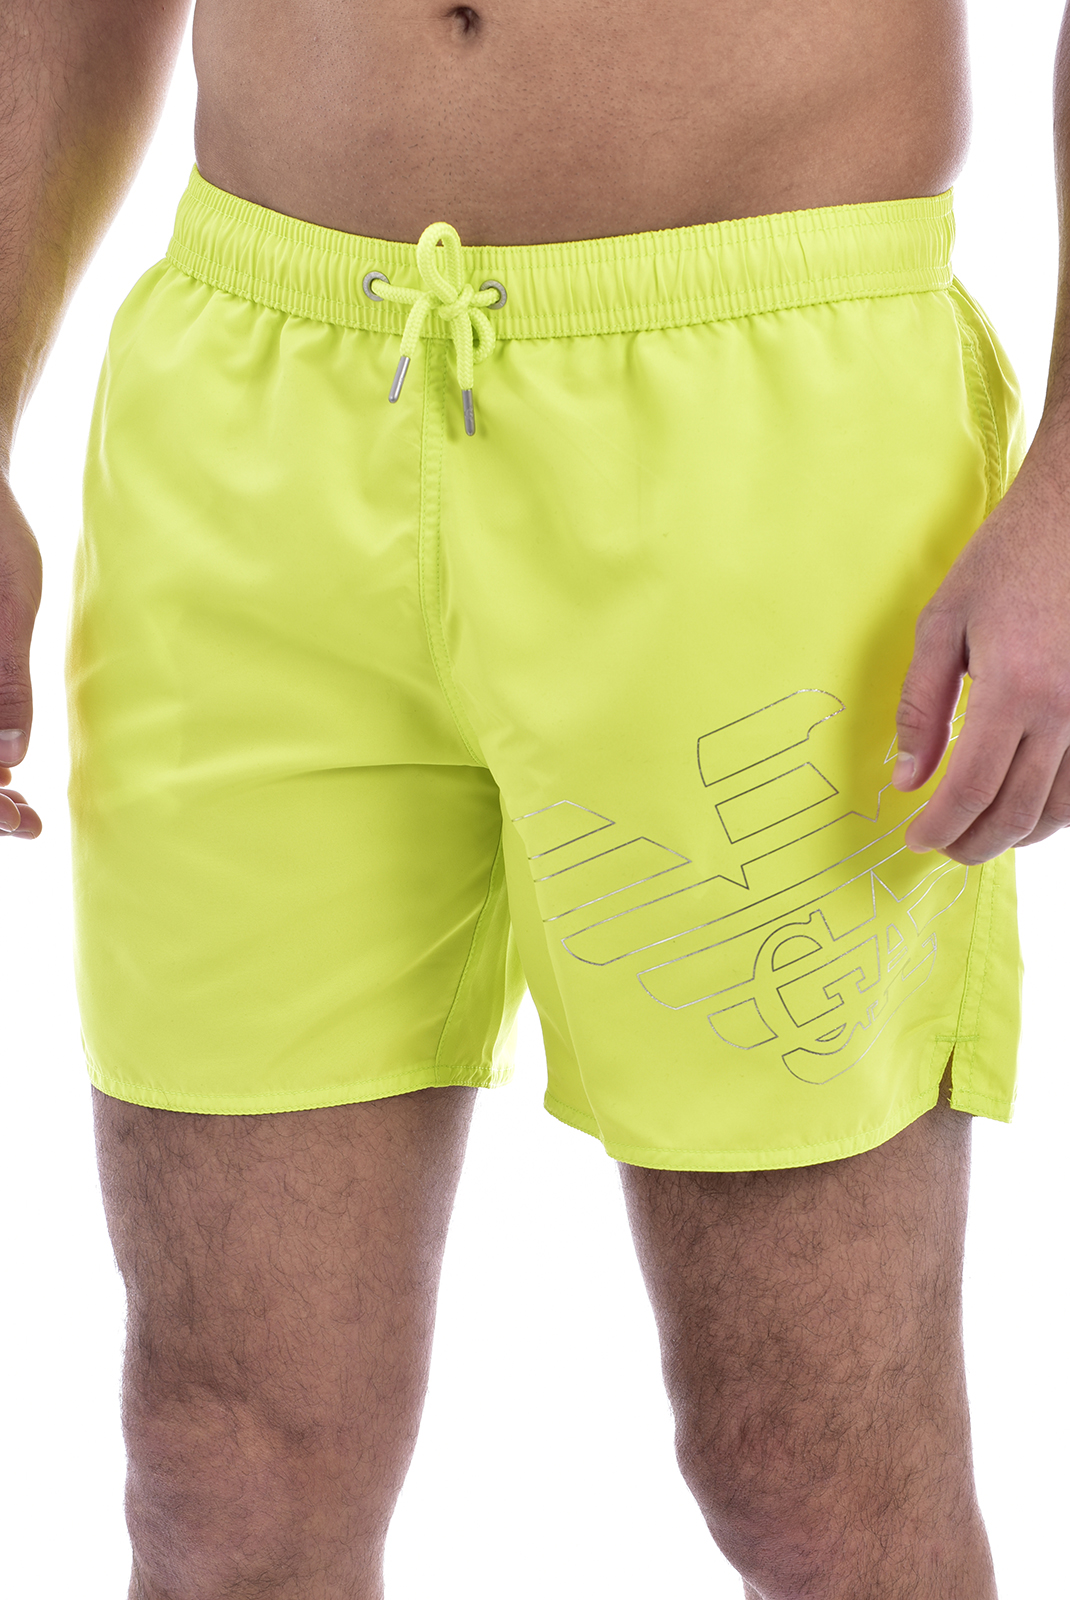 Shorts de bain  Emporio armani 211740 0P427 02660 SOLE